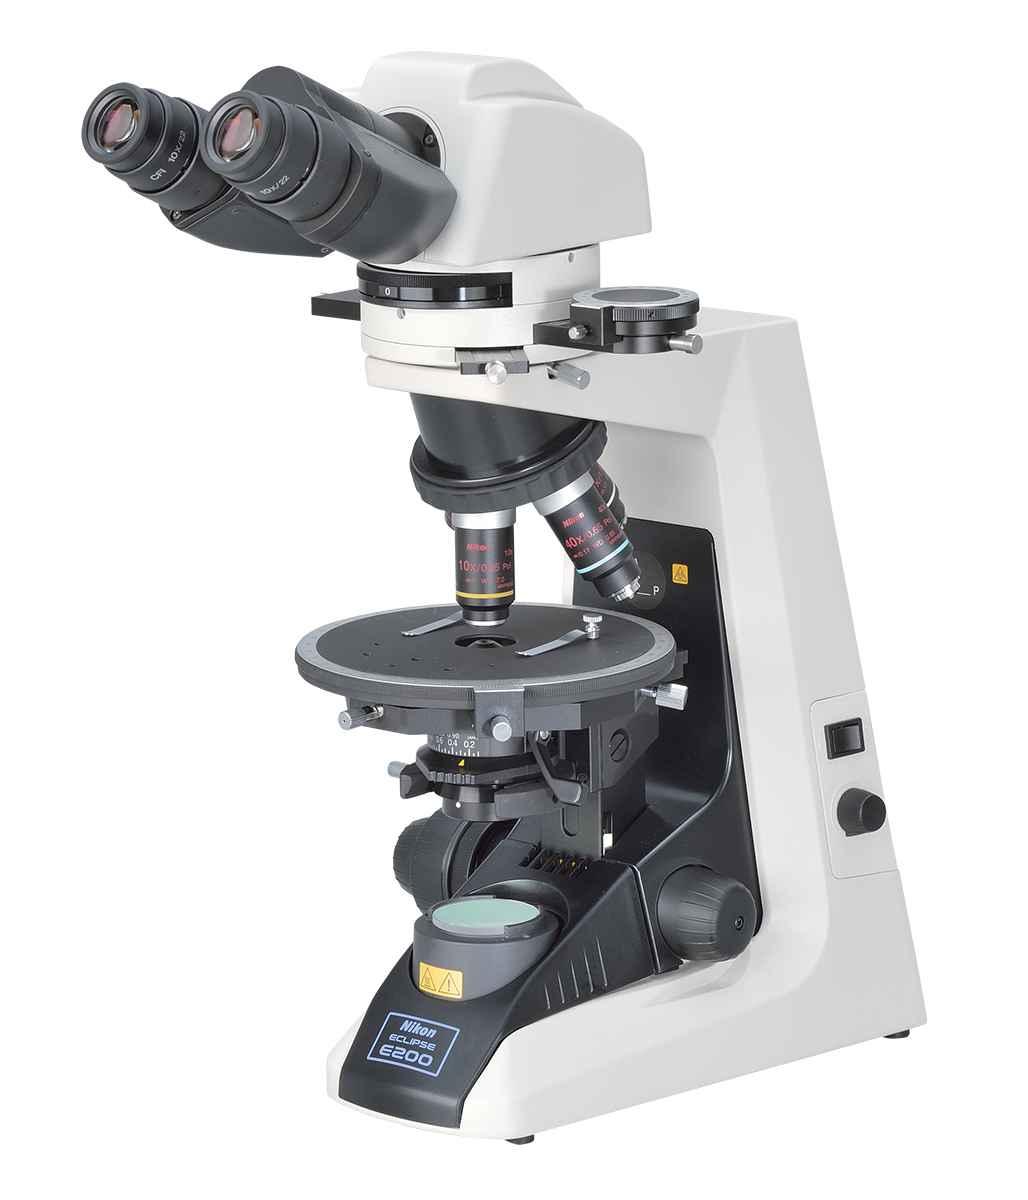 Eclipse E200 POL   Polarizing Microscopes   Products   Nikon